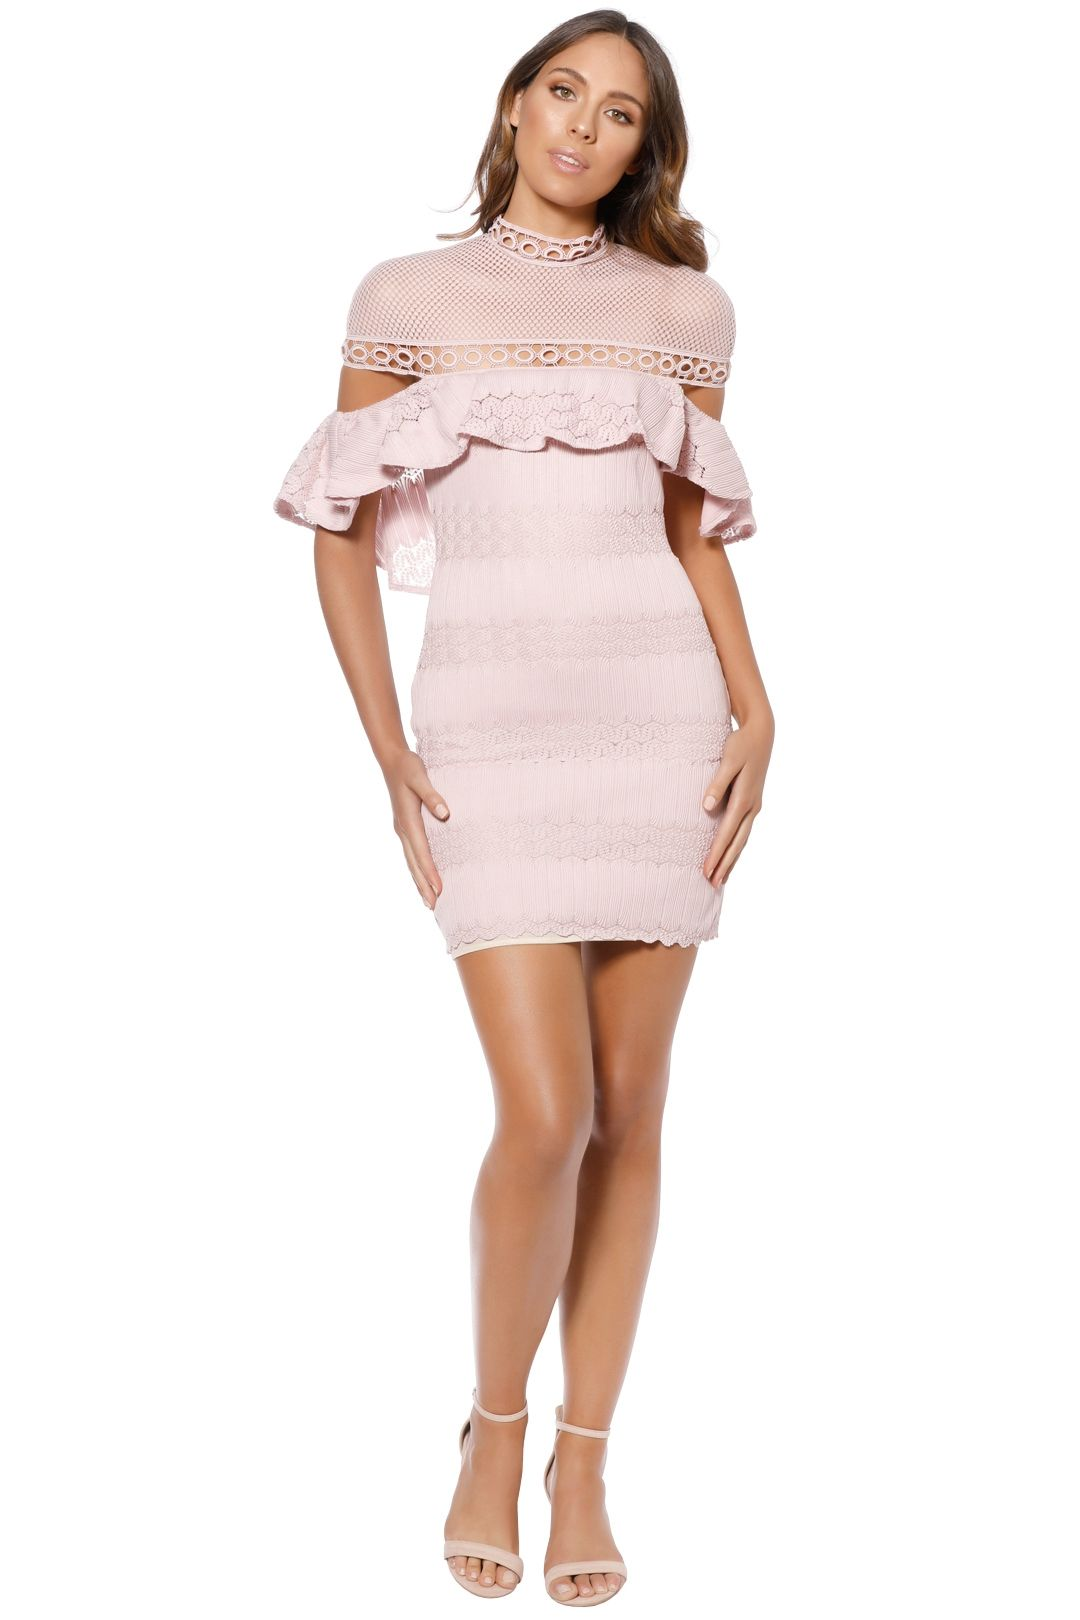 Elliatt - Pinnacle Dress - Pink - Front